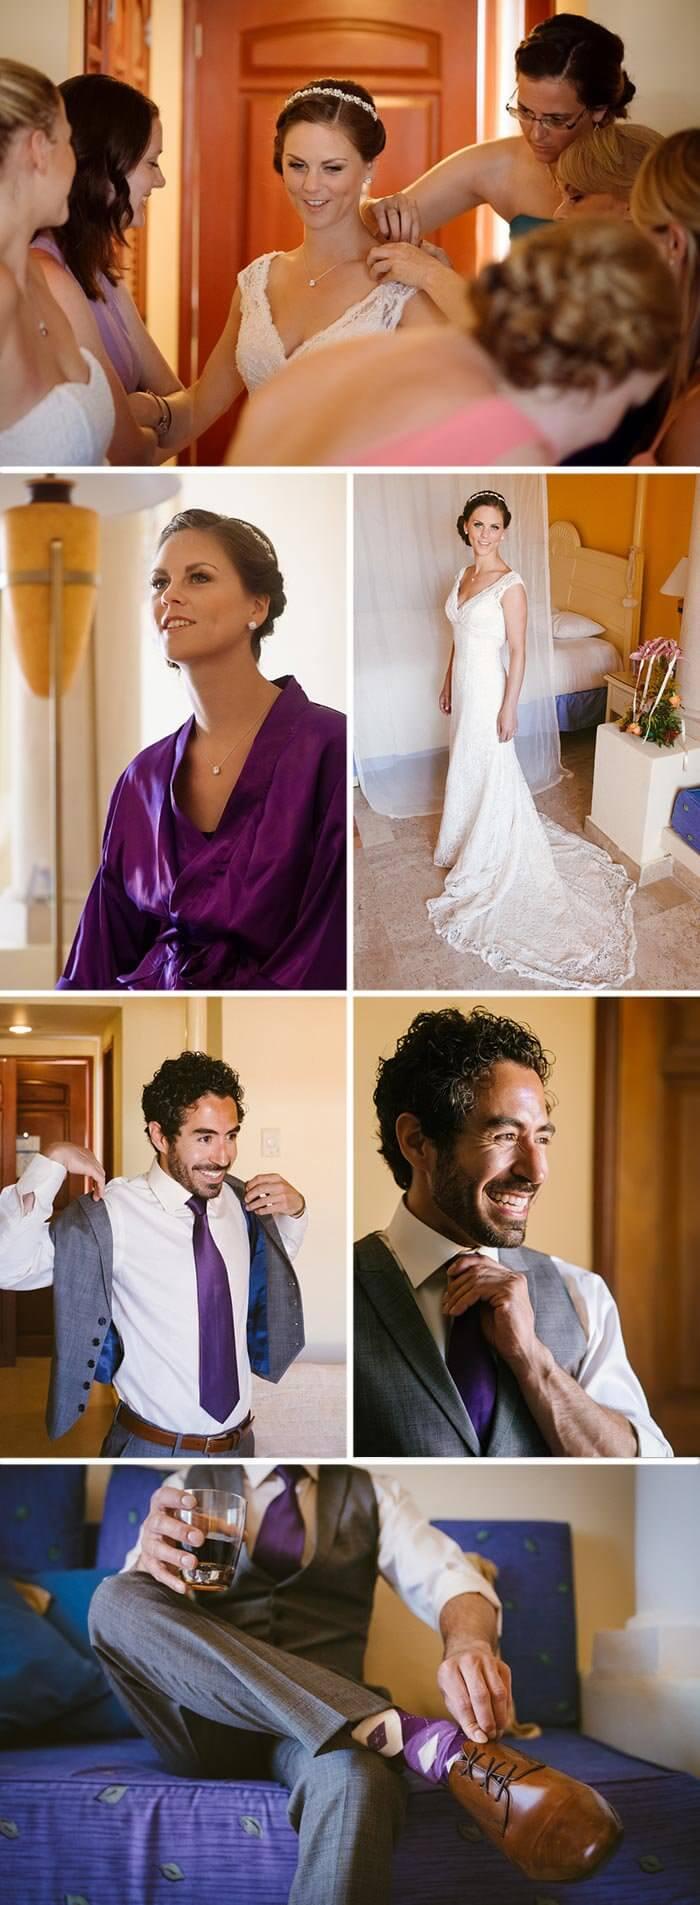 Heiraten in Mexiko I Gefhlvolle Fotostory mit viel